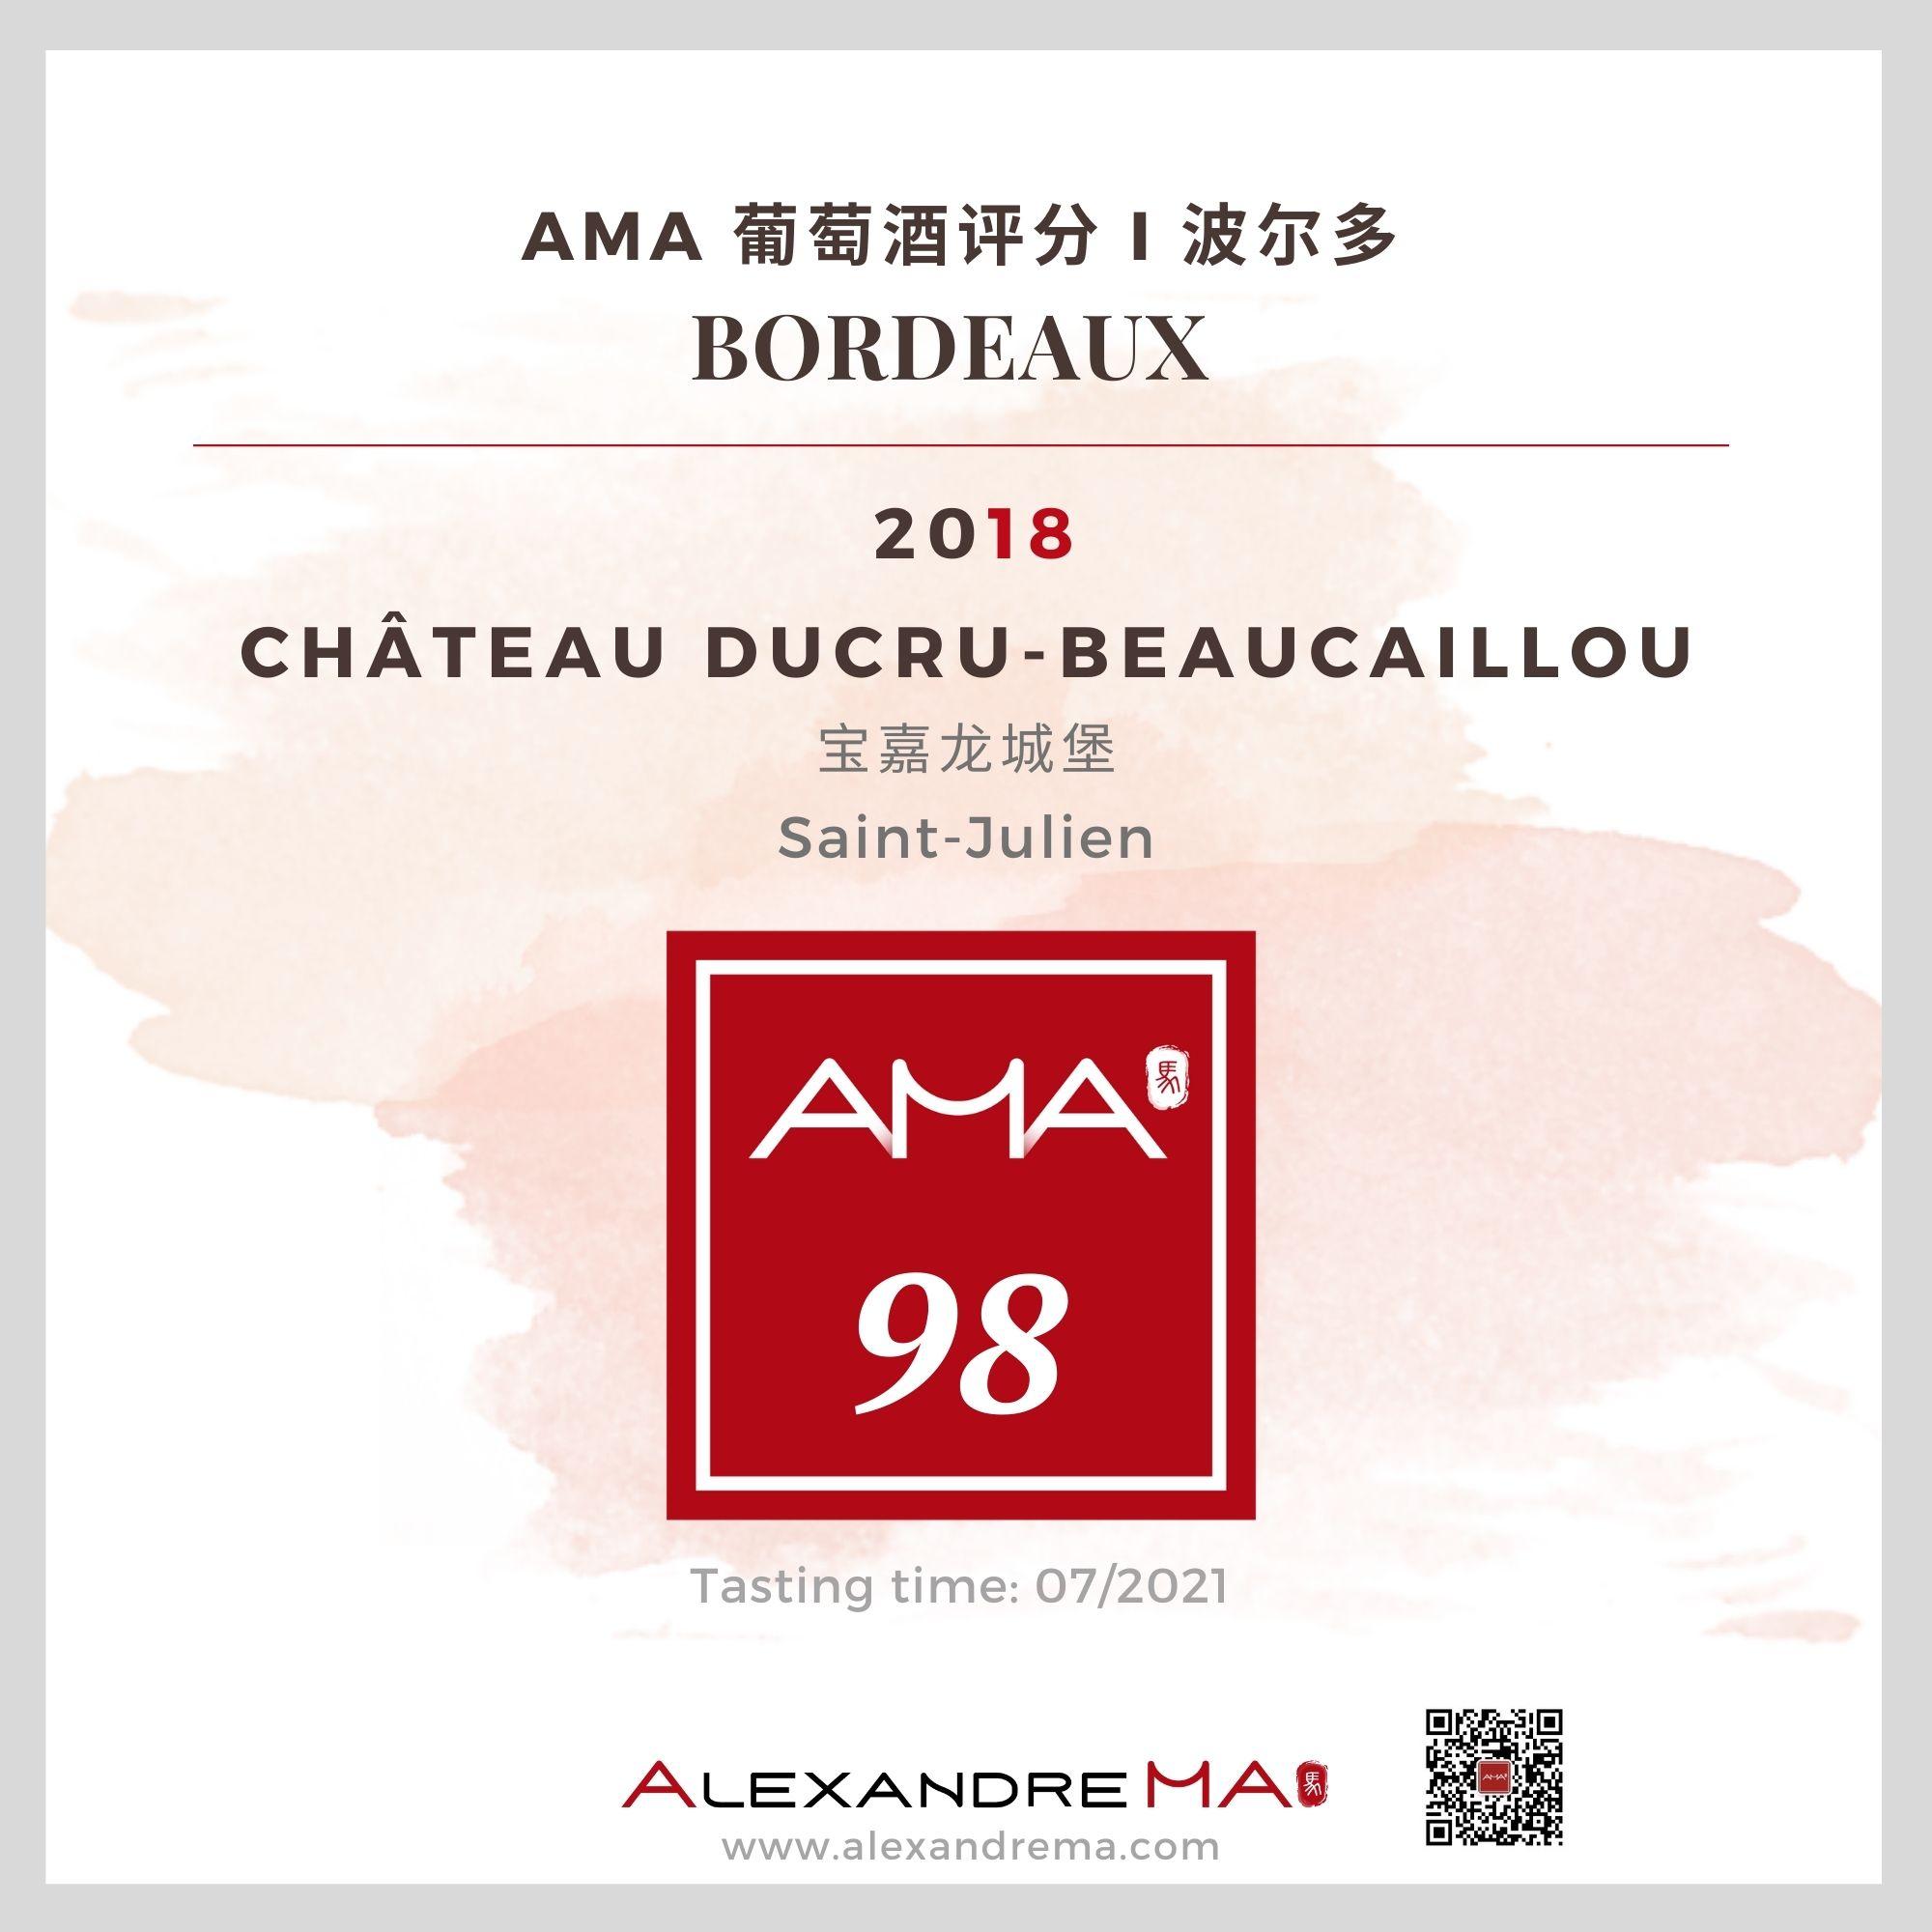 Château Ducru-Beaucaillou 2018 宝嘉龙城堡 - Alexandre Ma